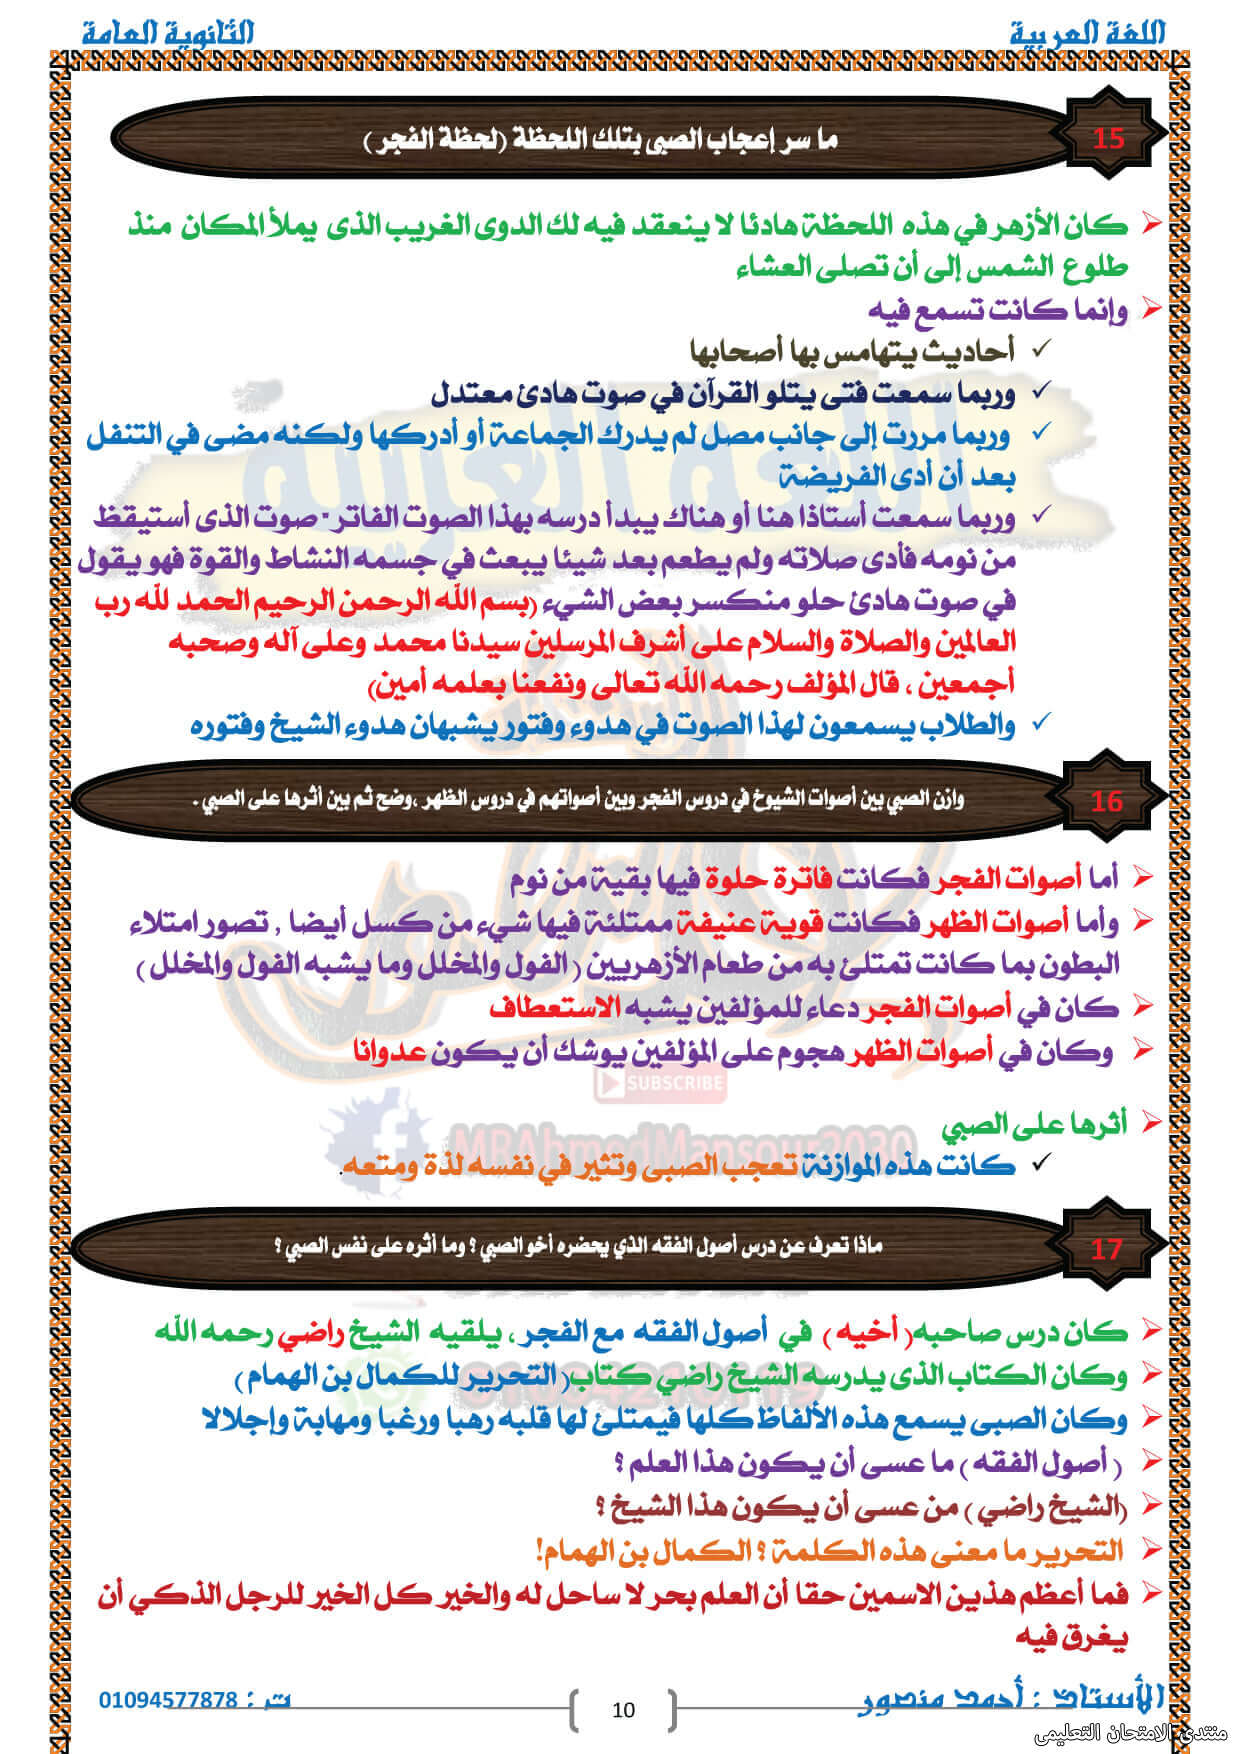 exam-eg.com_162025014518545.jpg